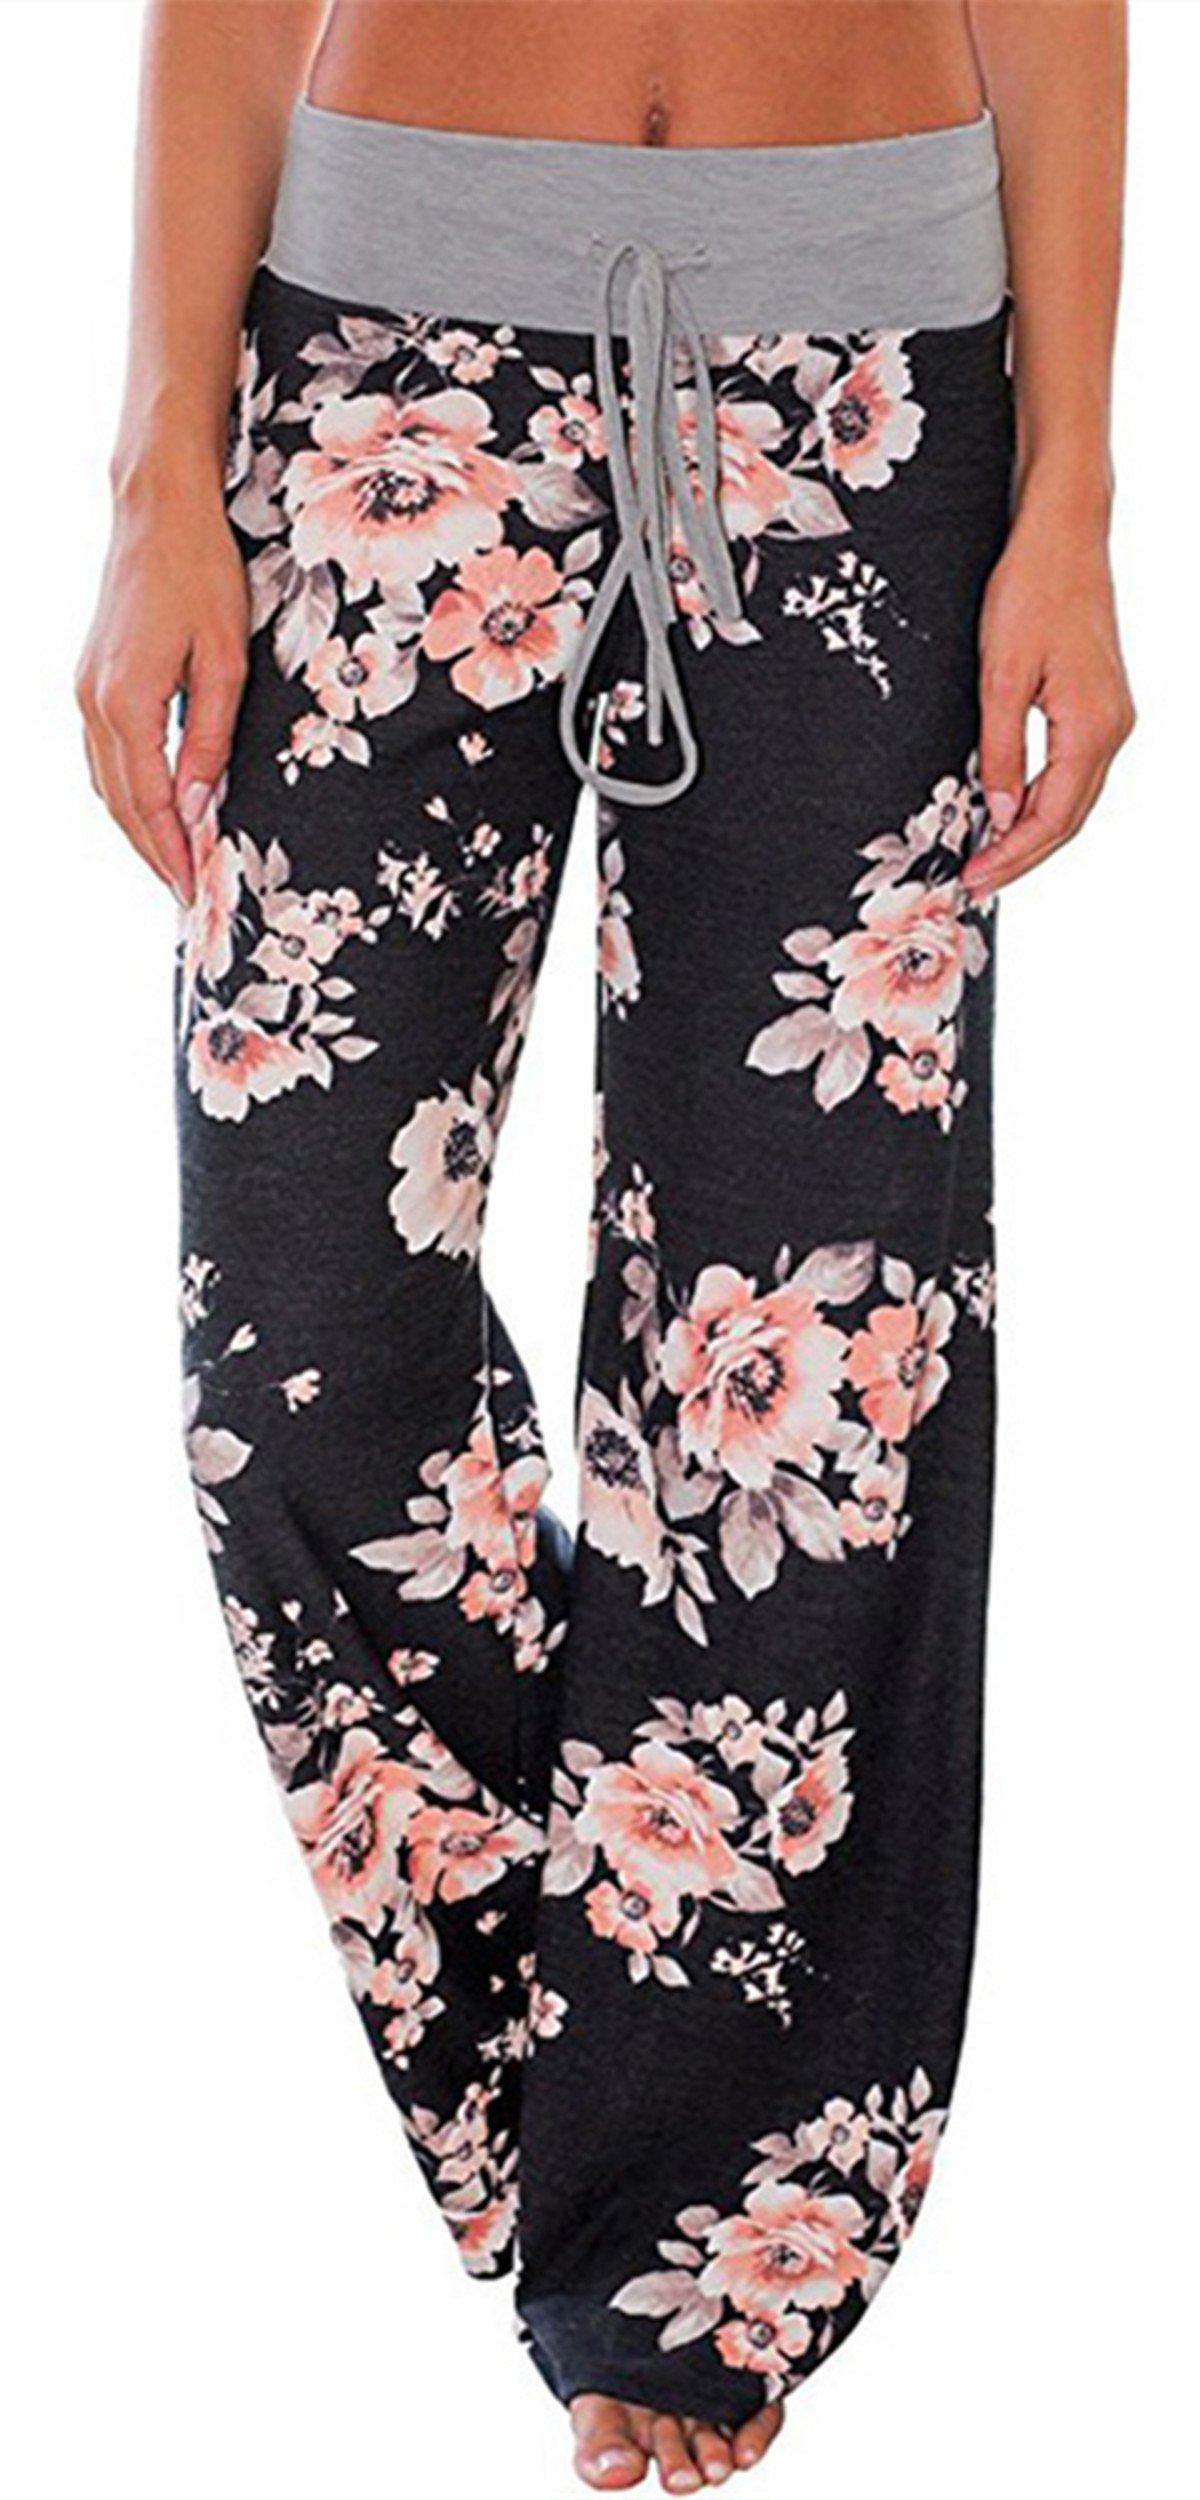 Sexymee Women's Comfy Pajamas Lounge Pants Floral Print Drawstring Wide Leg Palazzo Pants,Black 2,Medium